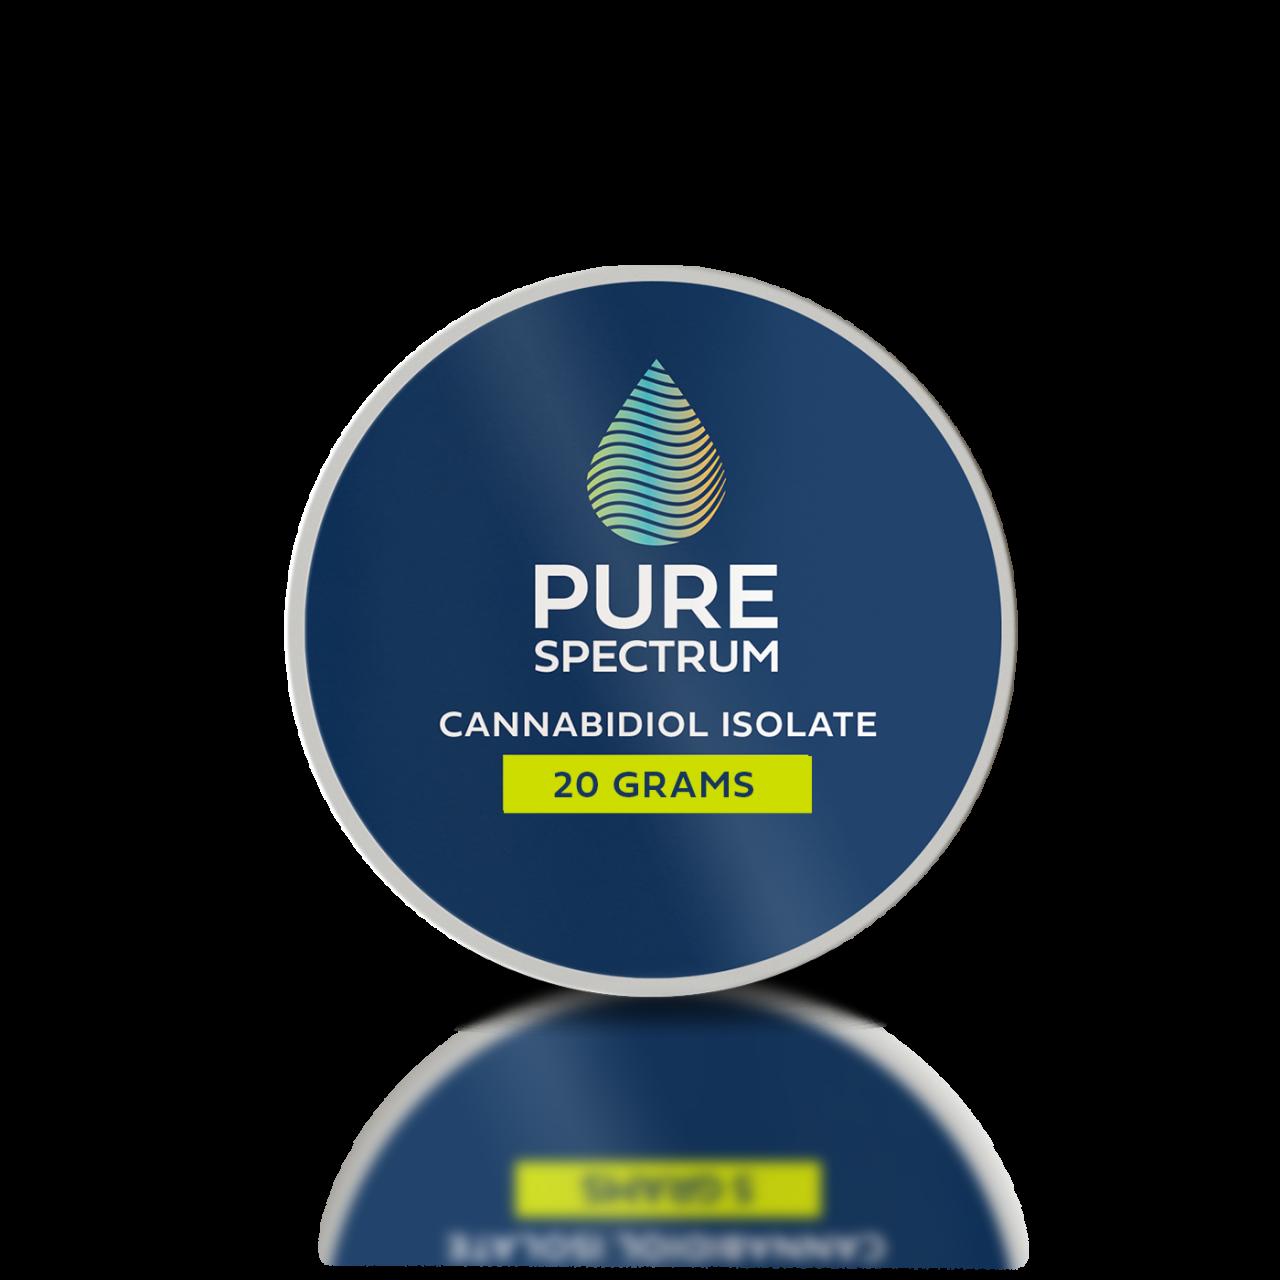 Pure_Spectrum__99__CBD_Isolate_Powder__20g__20000mg_CBD_1.png